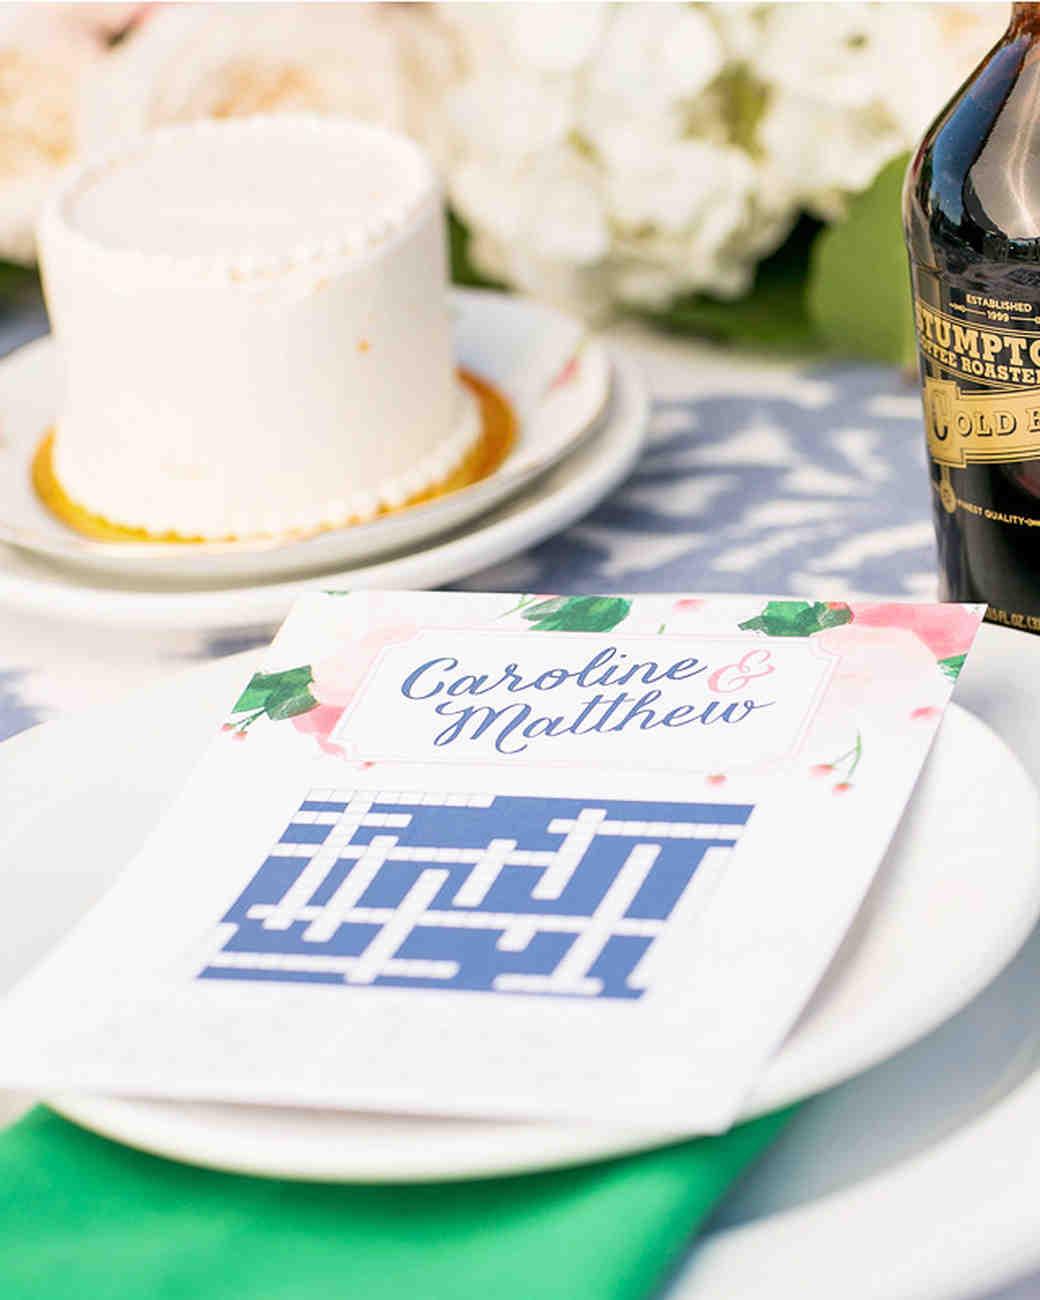 wedding-brunch-ideas-blue-green-table-scape-0416.jpg